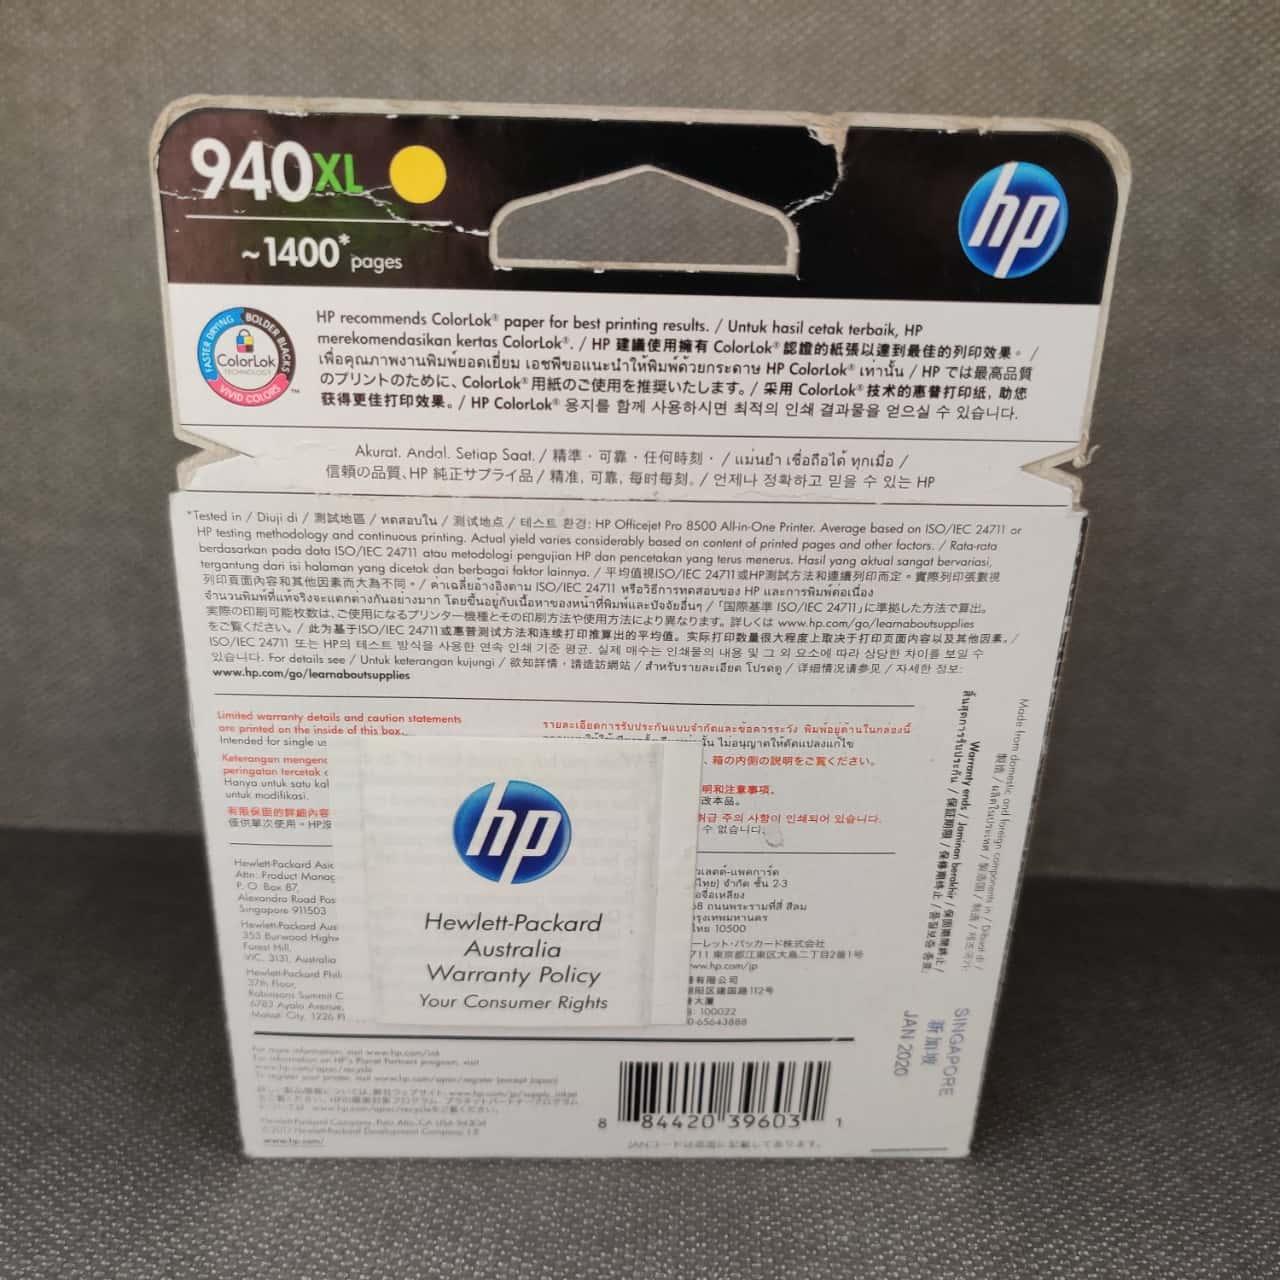 HP 940 XL Yellow Inkjet Cartridge for HP Officejet printers as per photo list